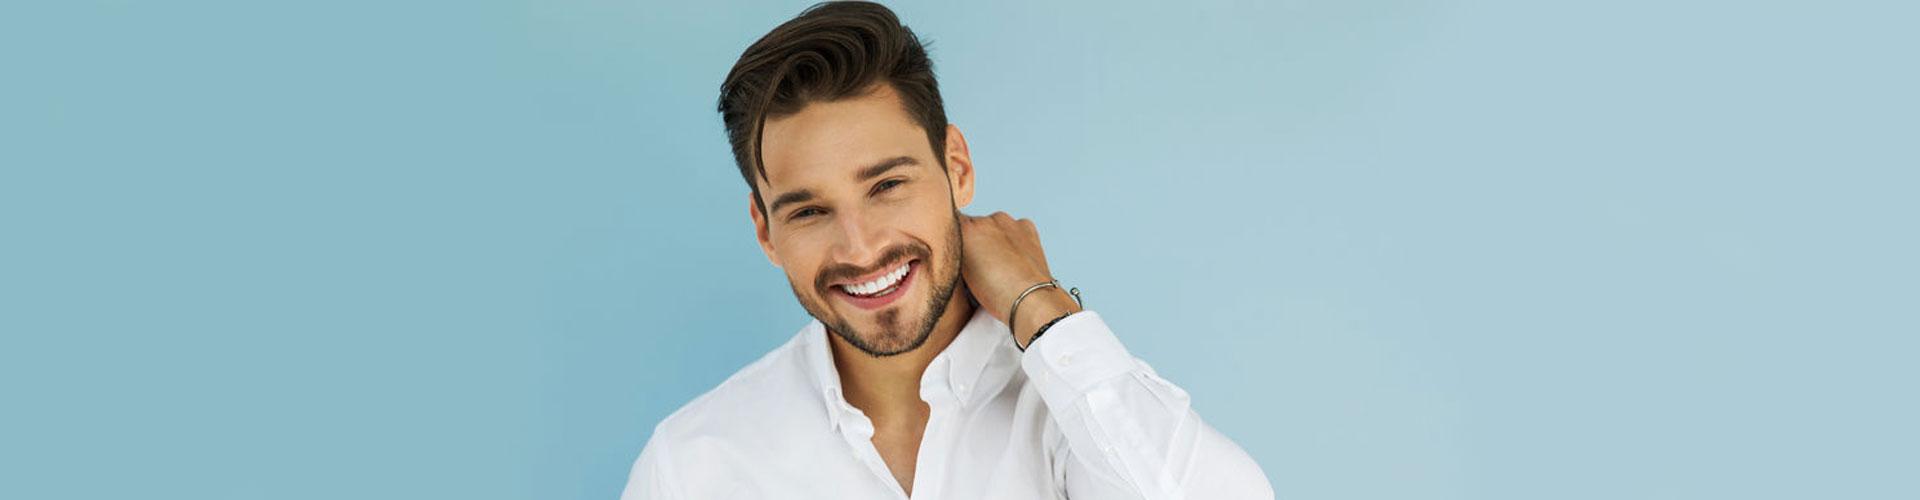 men's haircuts & styles, top hair salon, northampton